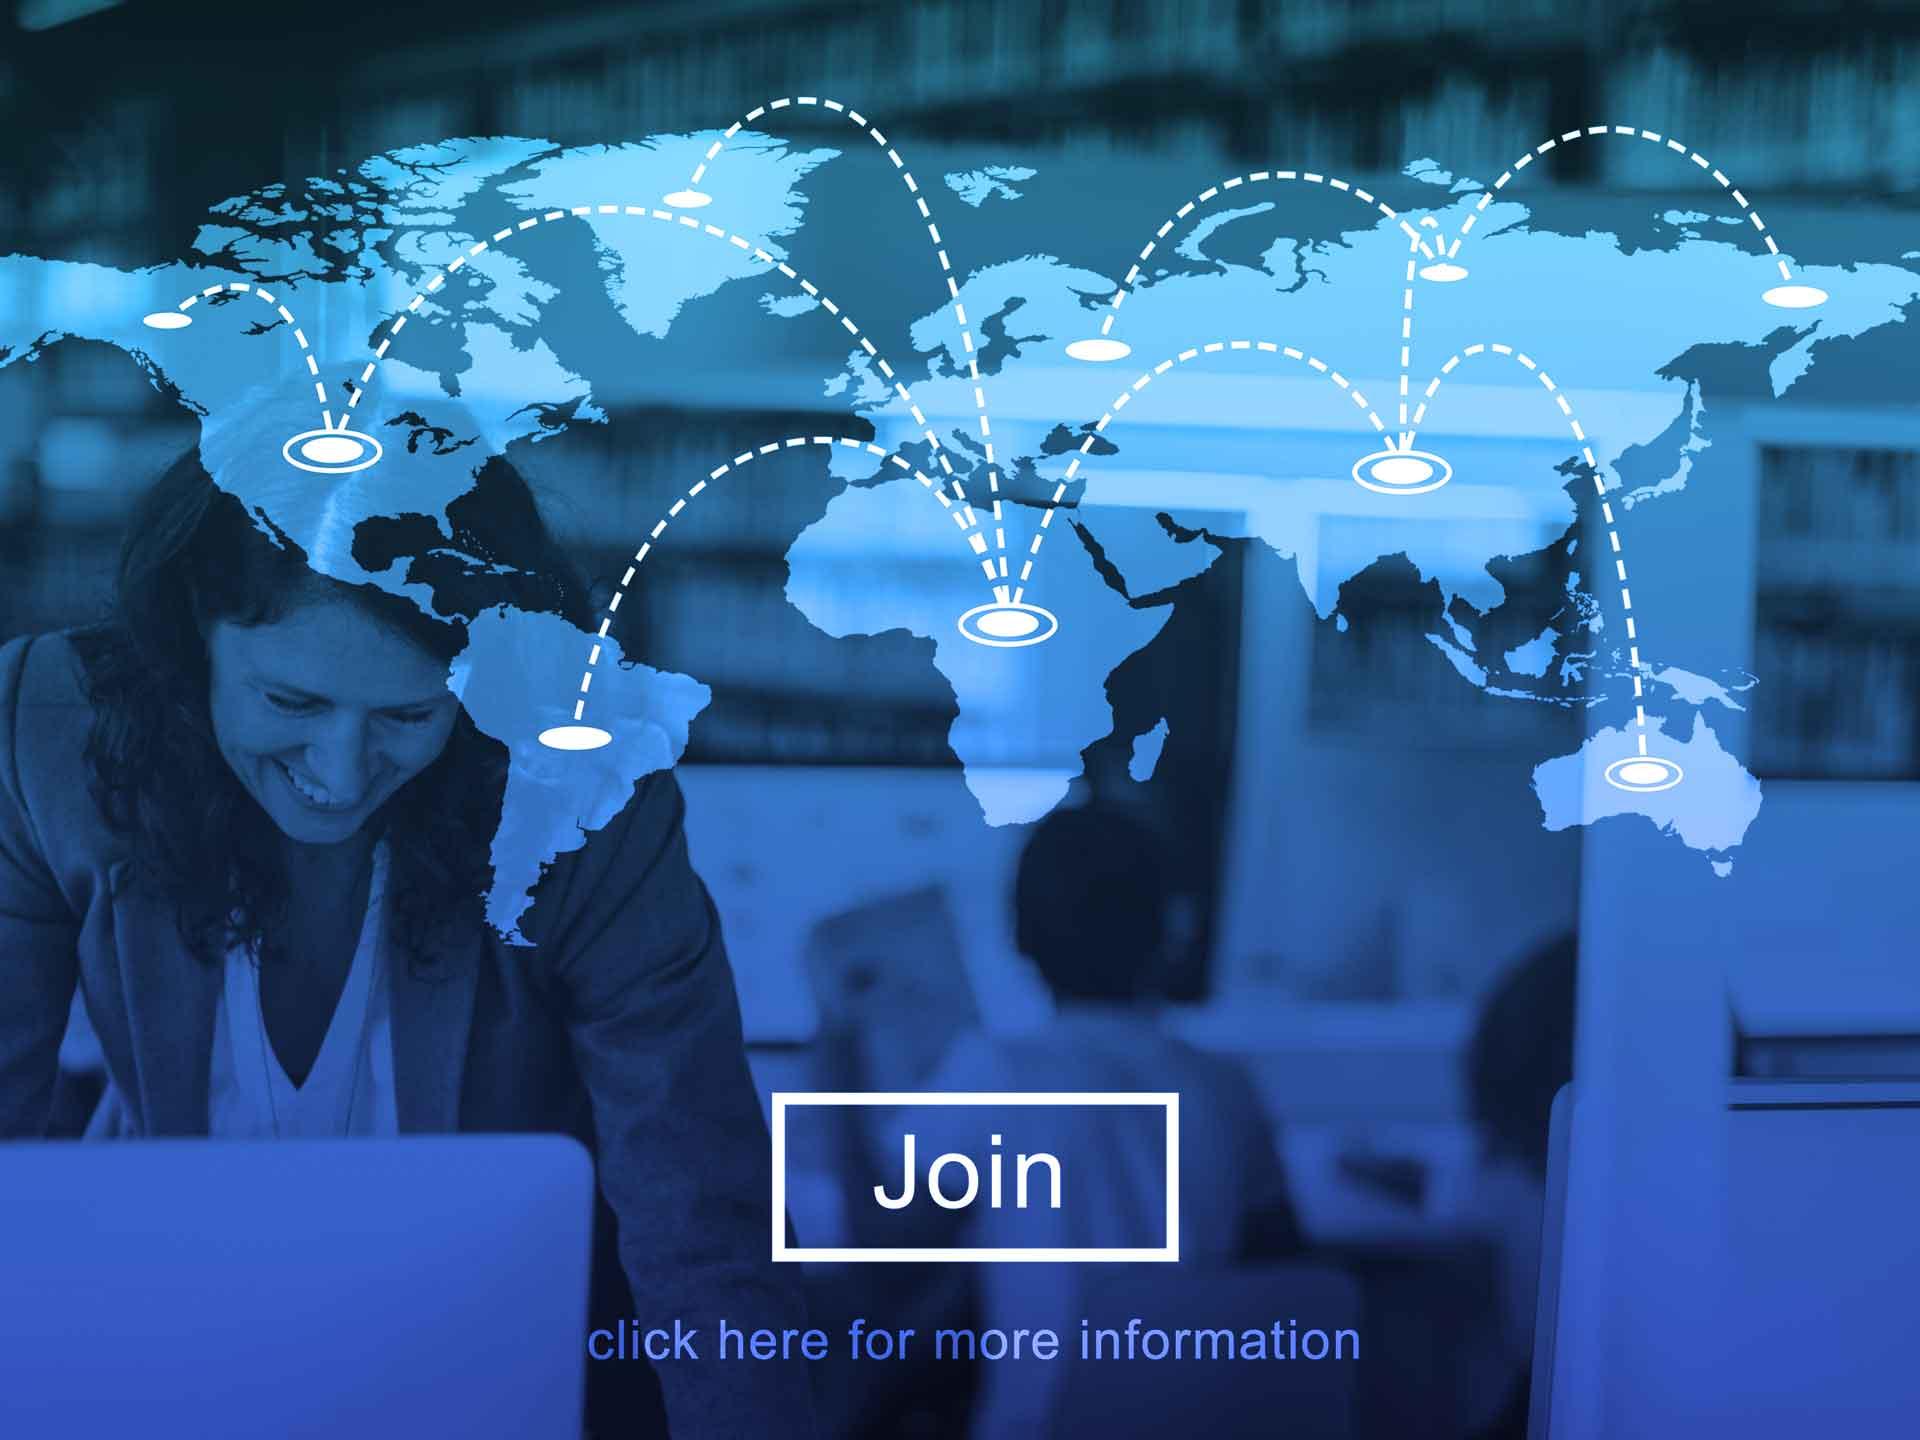 Werving en selectie met Dynamics 365 Human Resources van Microsoft